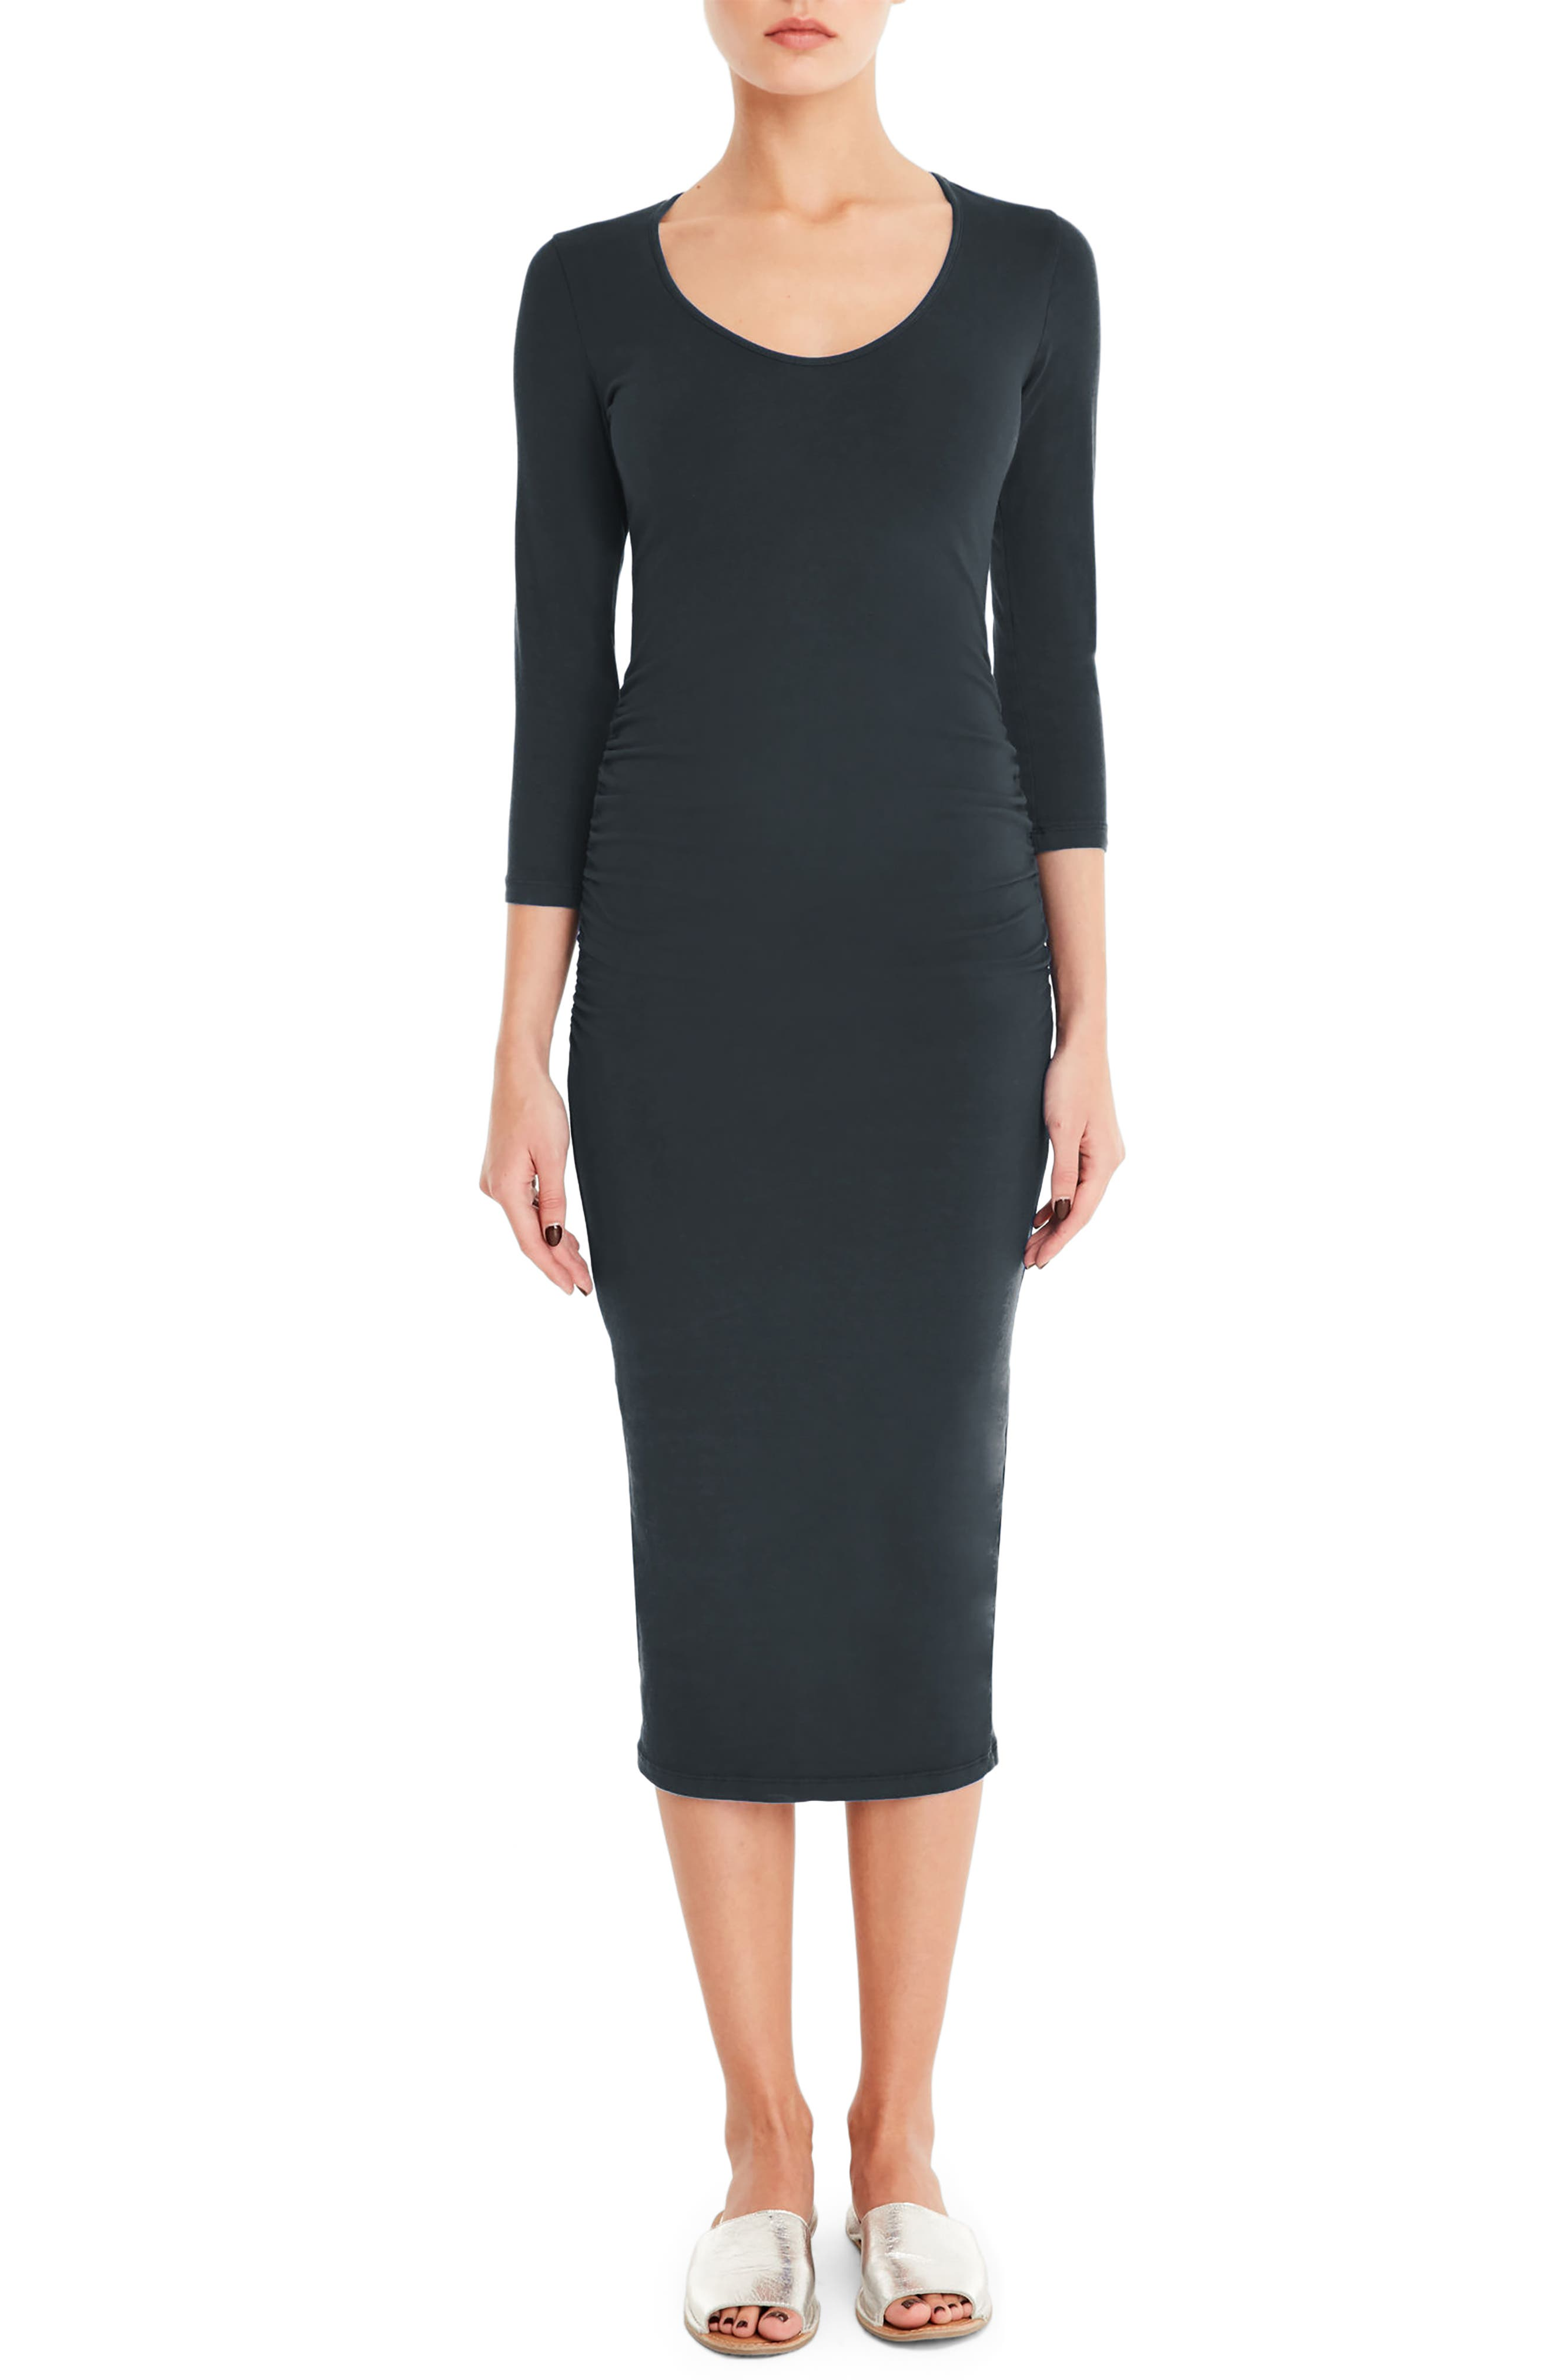 MICHAEL STARS Ruched Midi Dress, Main, color, OXIDE